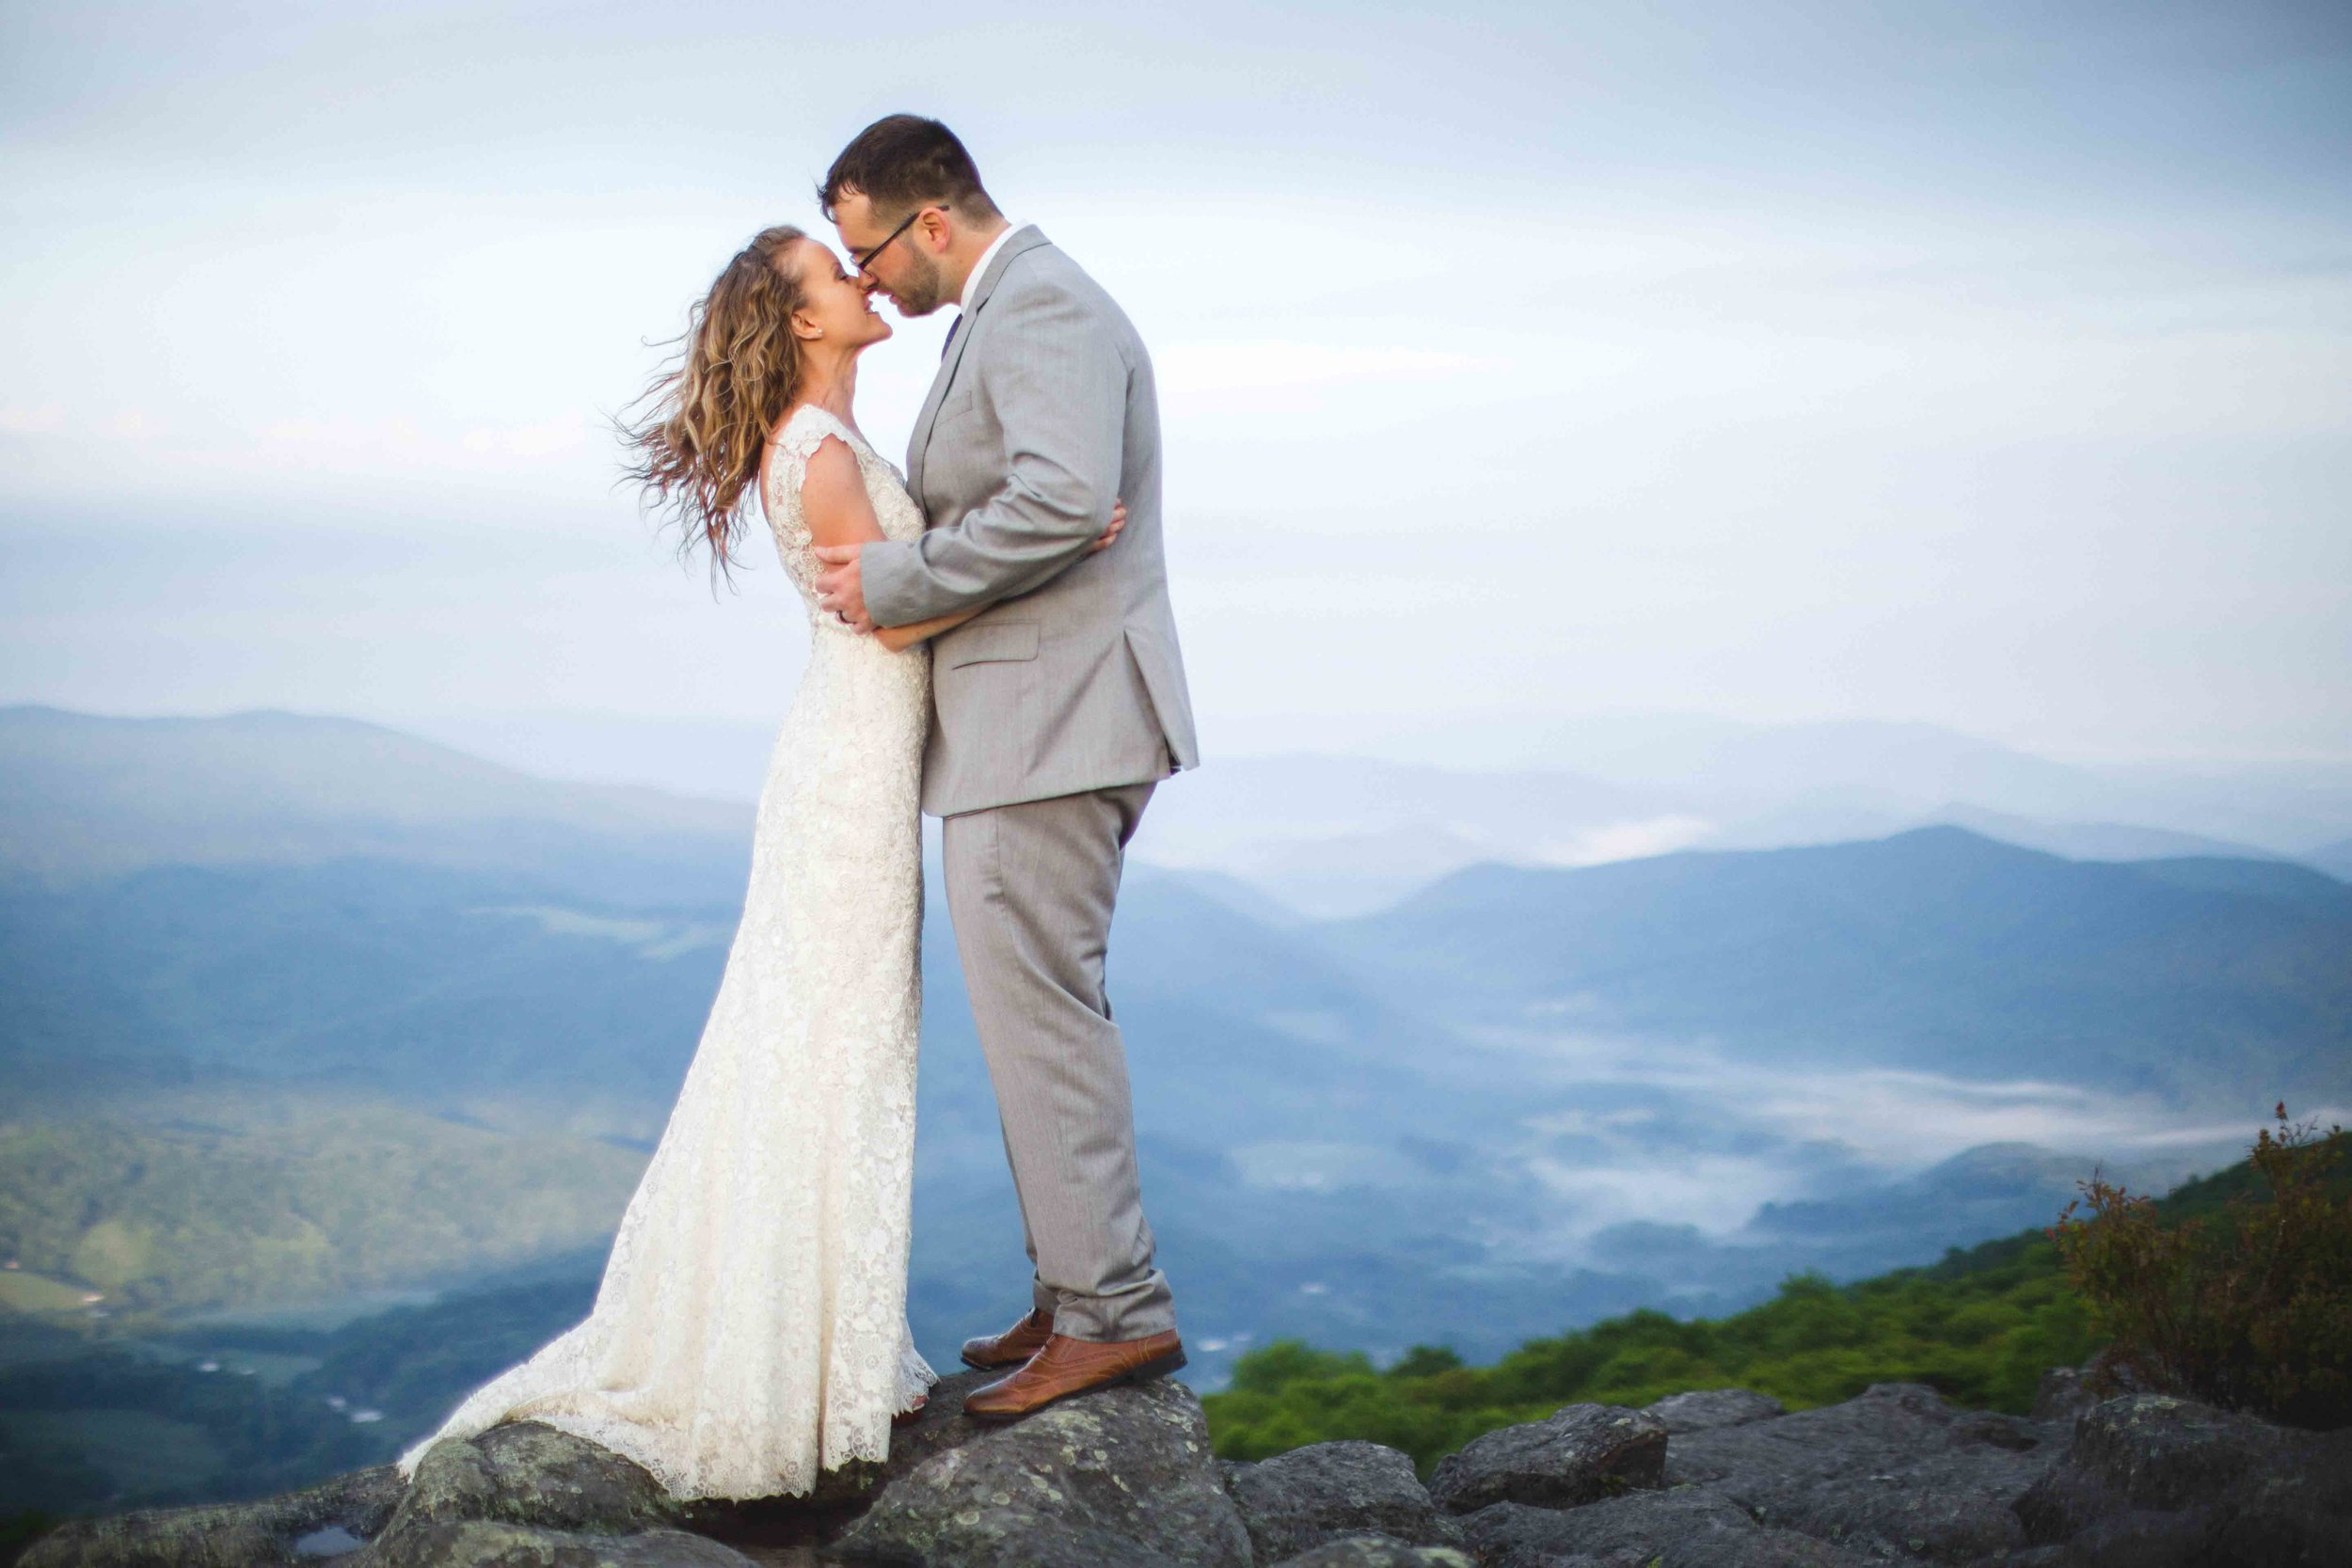 north-carolina-elopement-photographer-72.jpg